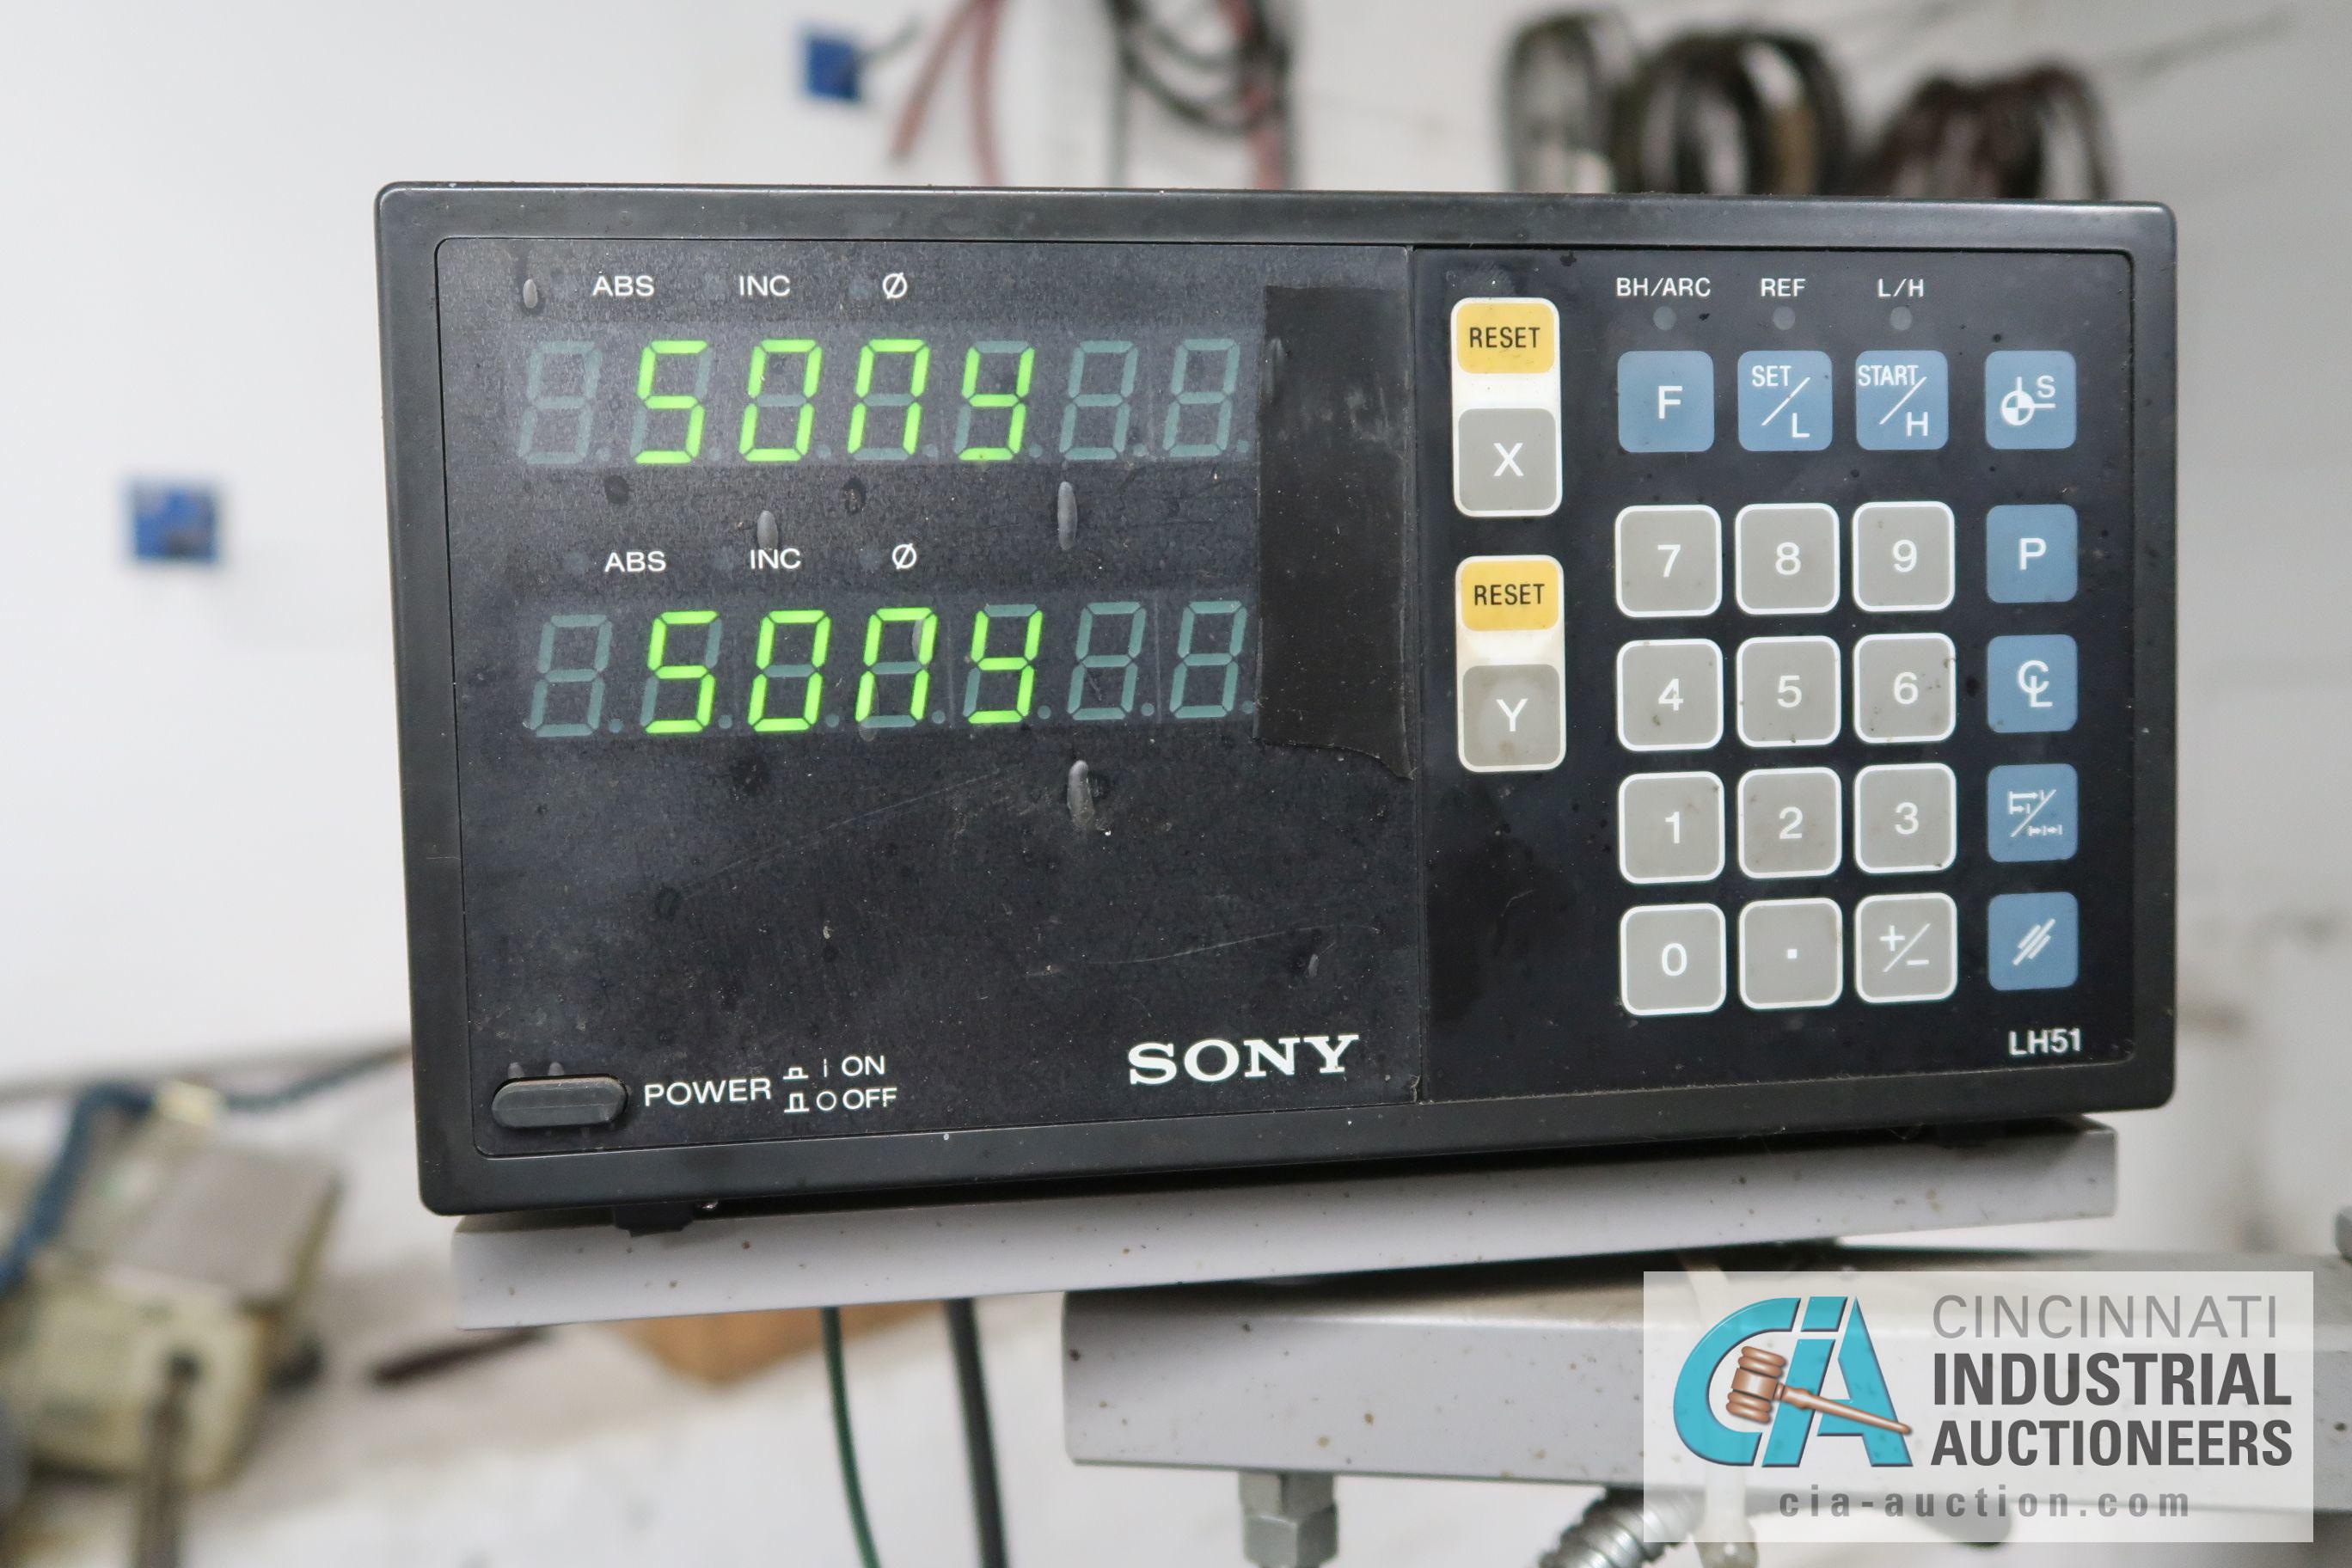 "2 HP CINCINNATI VERTICAL MILLING MACHINE; S/N 6J4V5L-155 WITH DRO, 10"" X 42"" POWER FEED TABLE - Image 5 of 8"